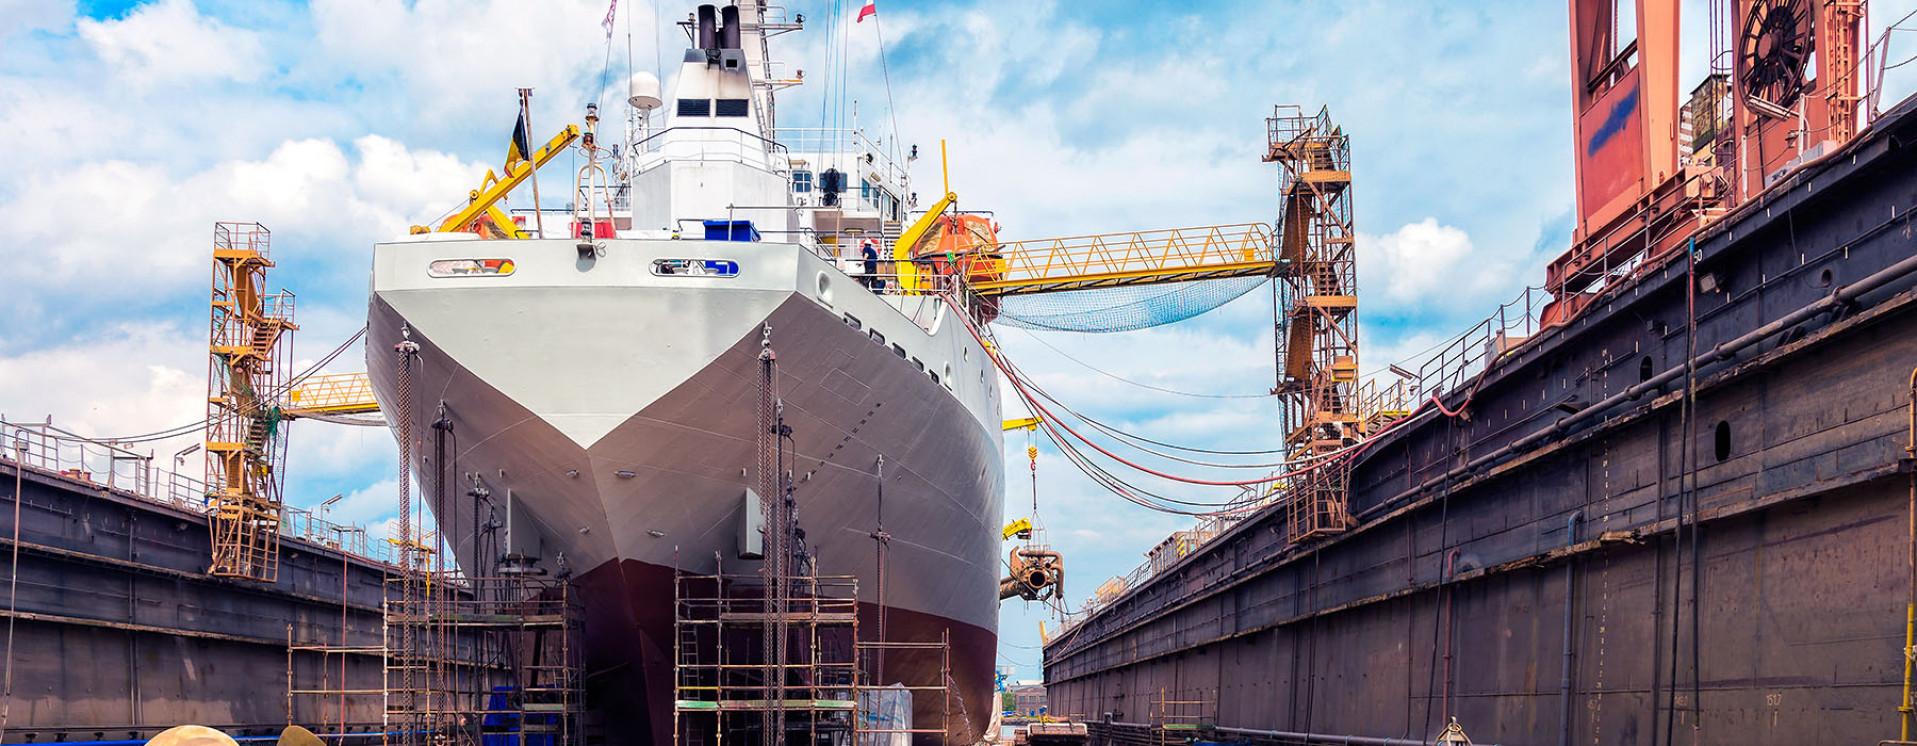 settore navale.jpg